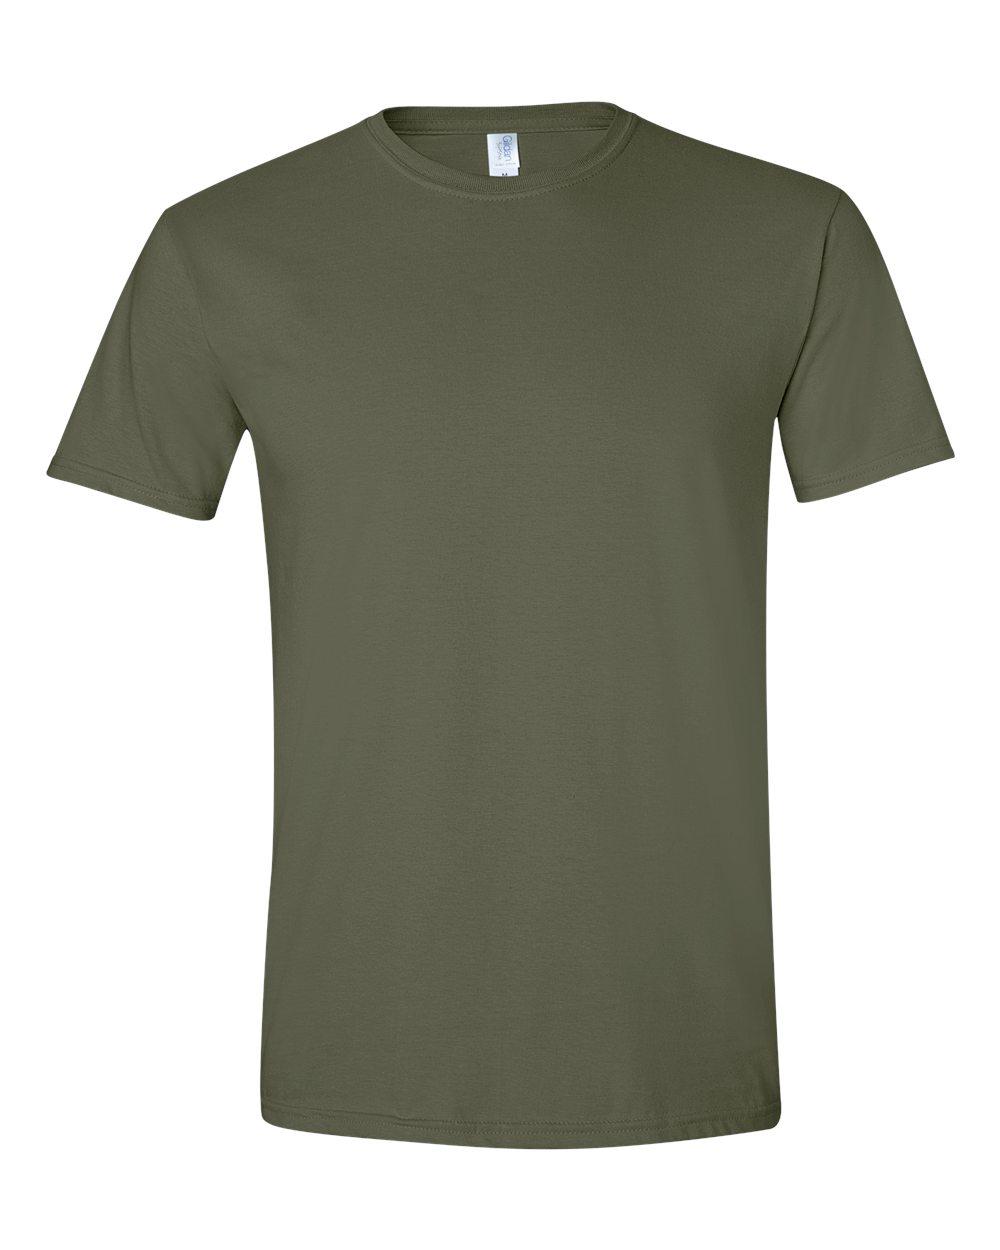 3ef9d8c8 GILDAN SoftStyle Ring Spun T-Shirt | Custom T Shirts | Entripy